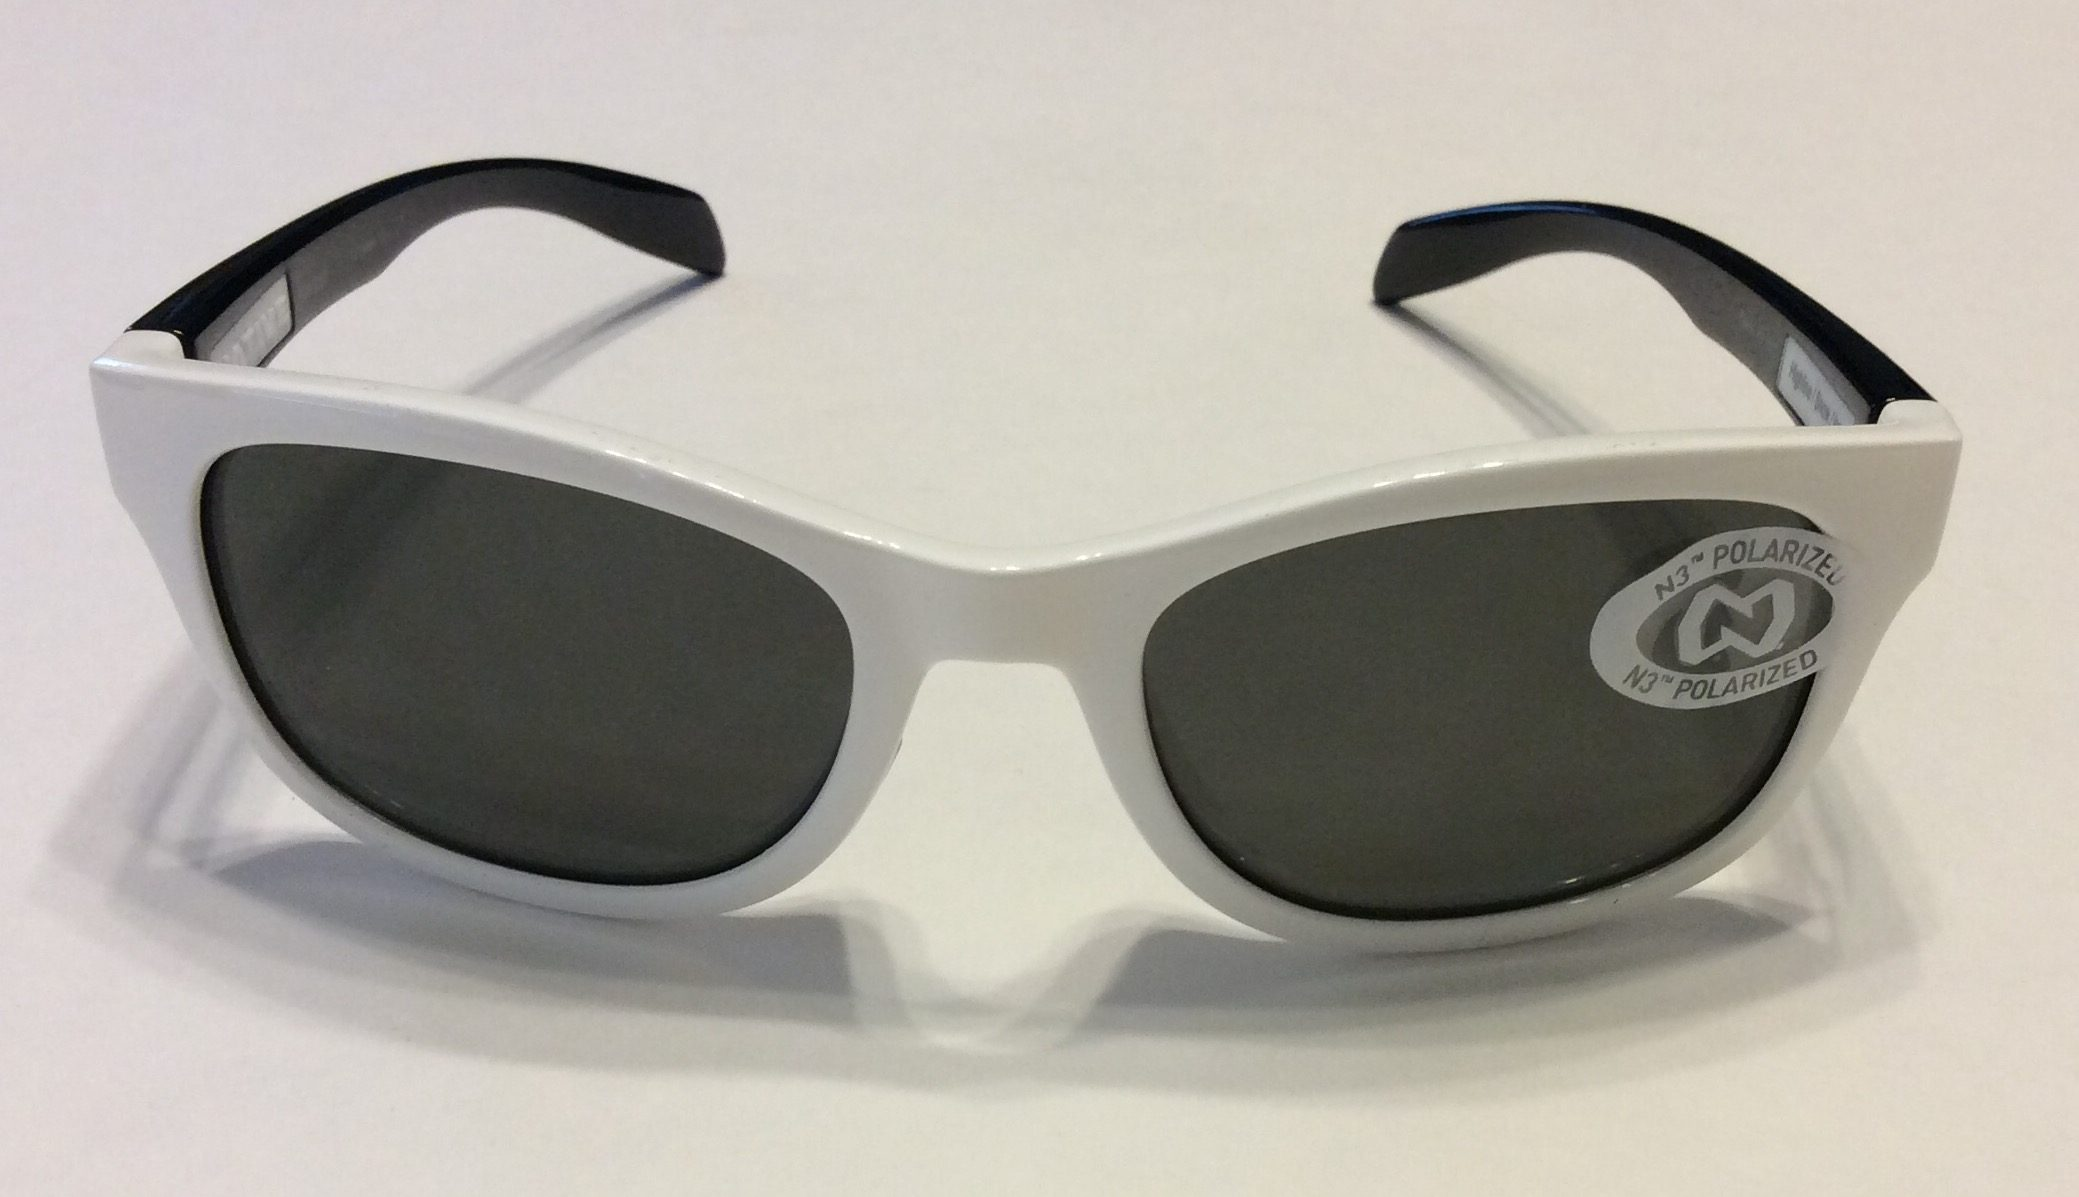 Best polarized sunglasses for fishing shopping center for Best fishing sunglasses